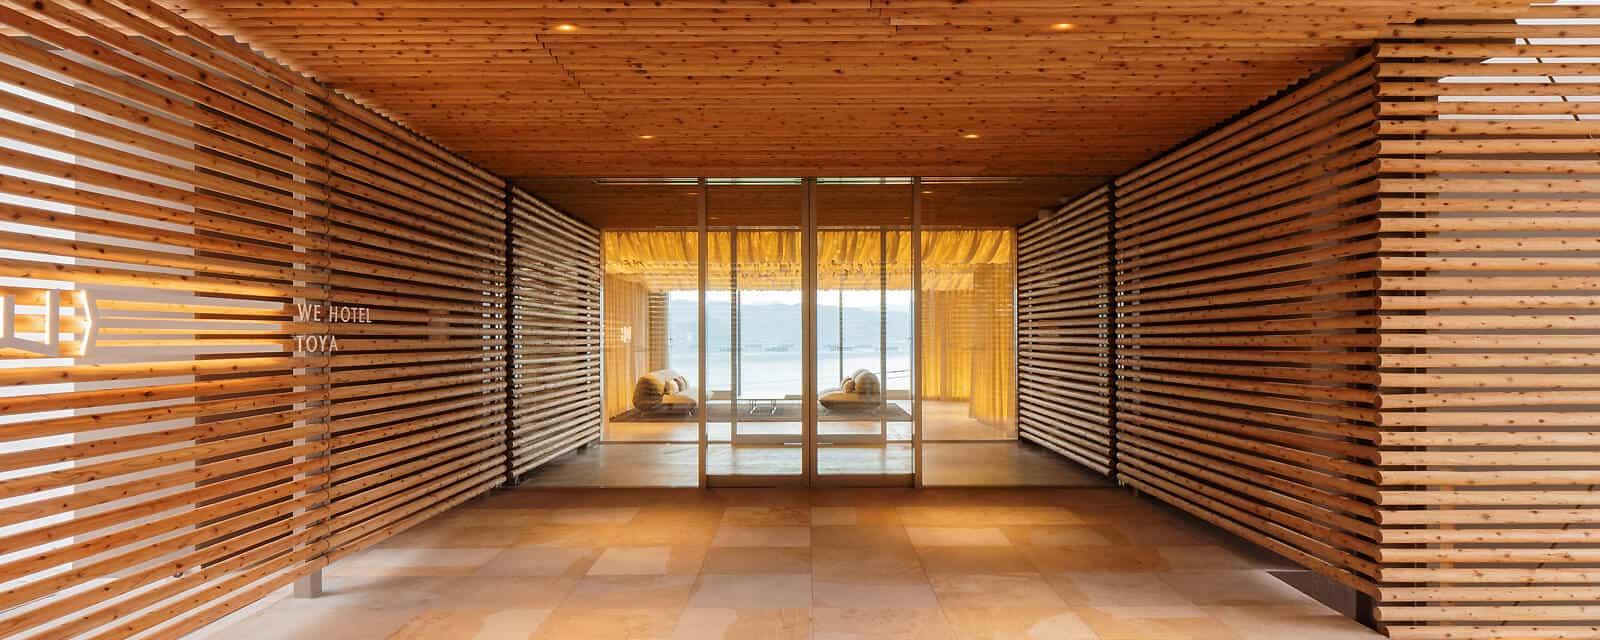 WE Hotel Toya design by Kengo Kuma